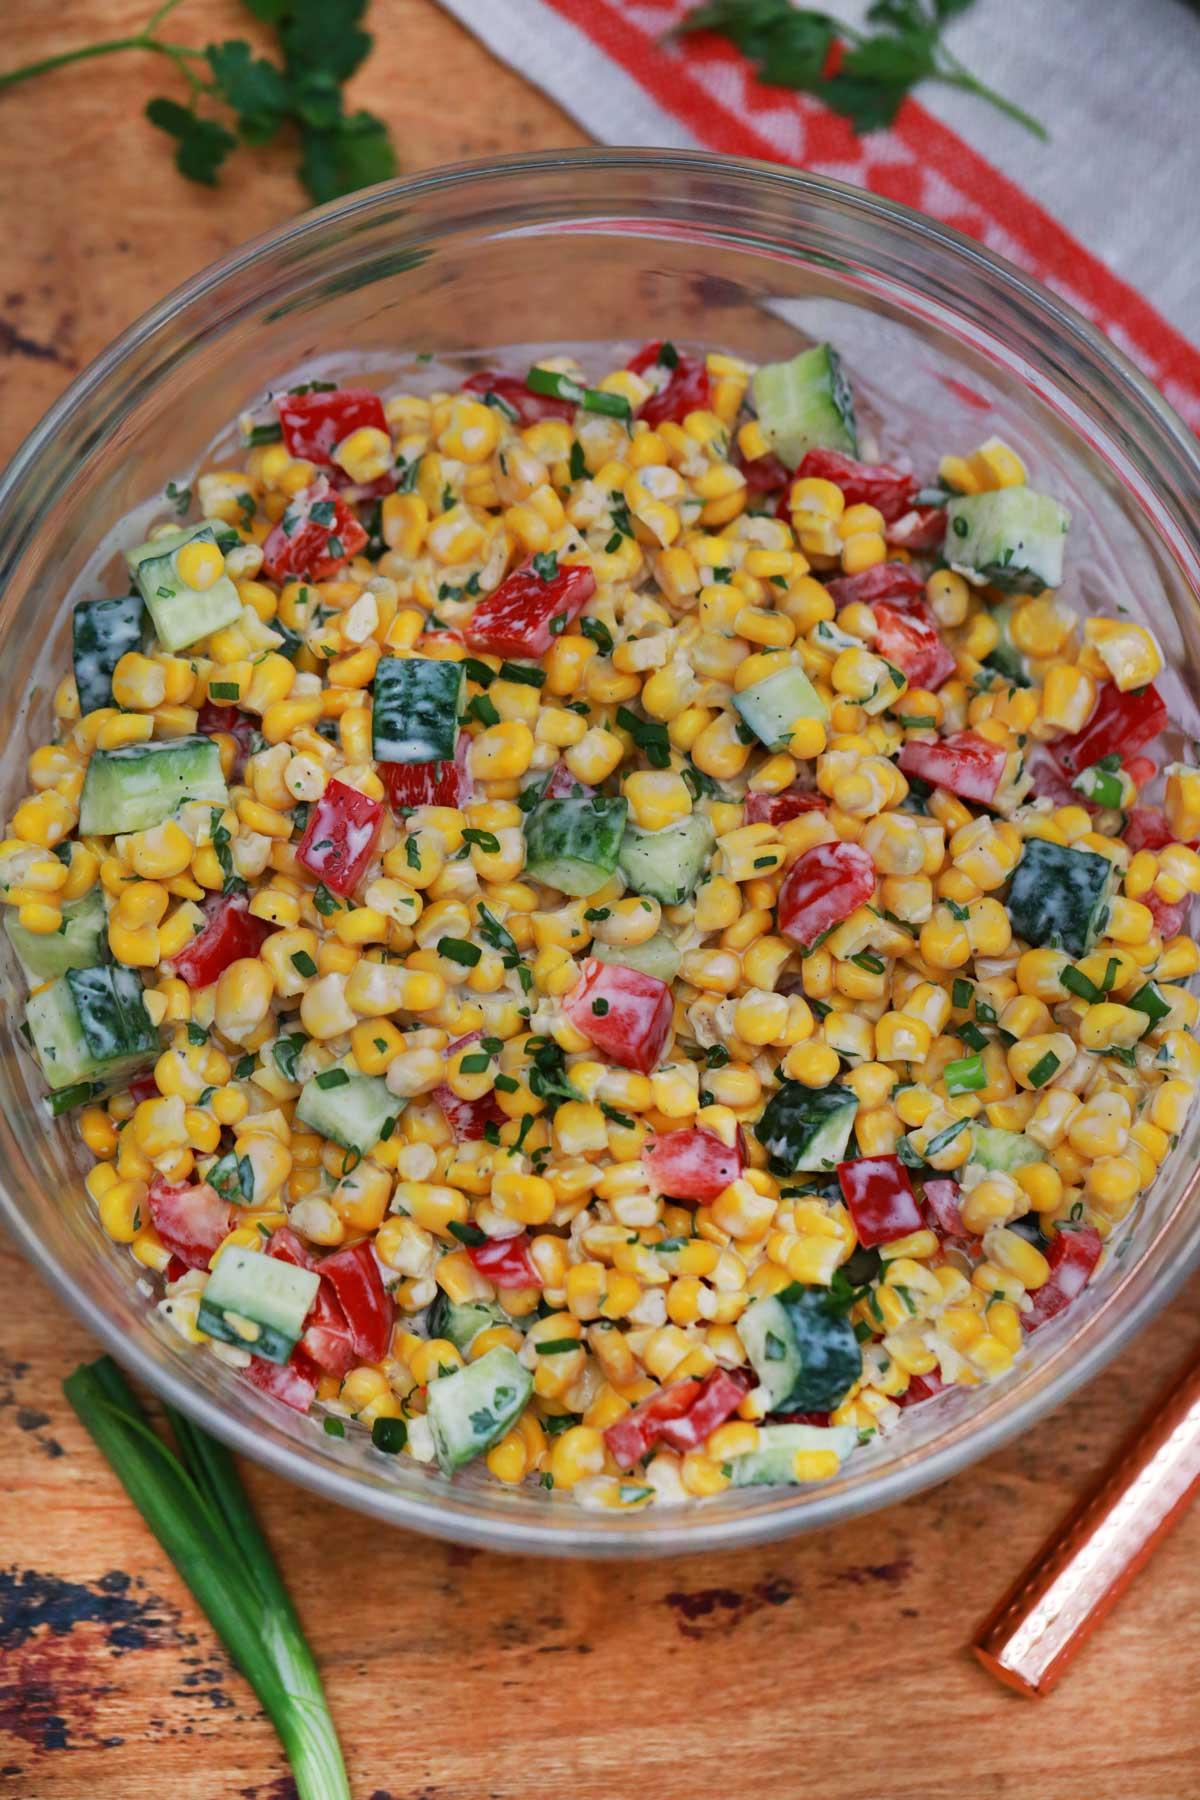 Creamy corn salad in large glass bowl